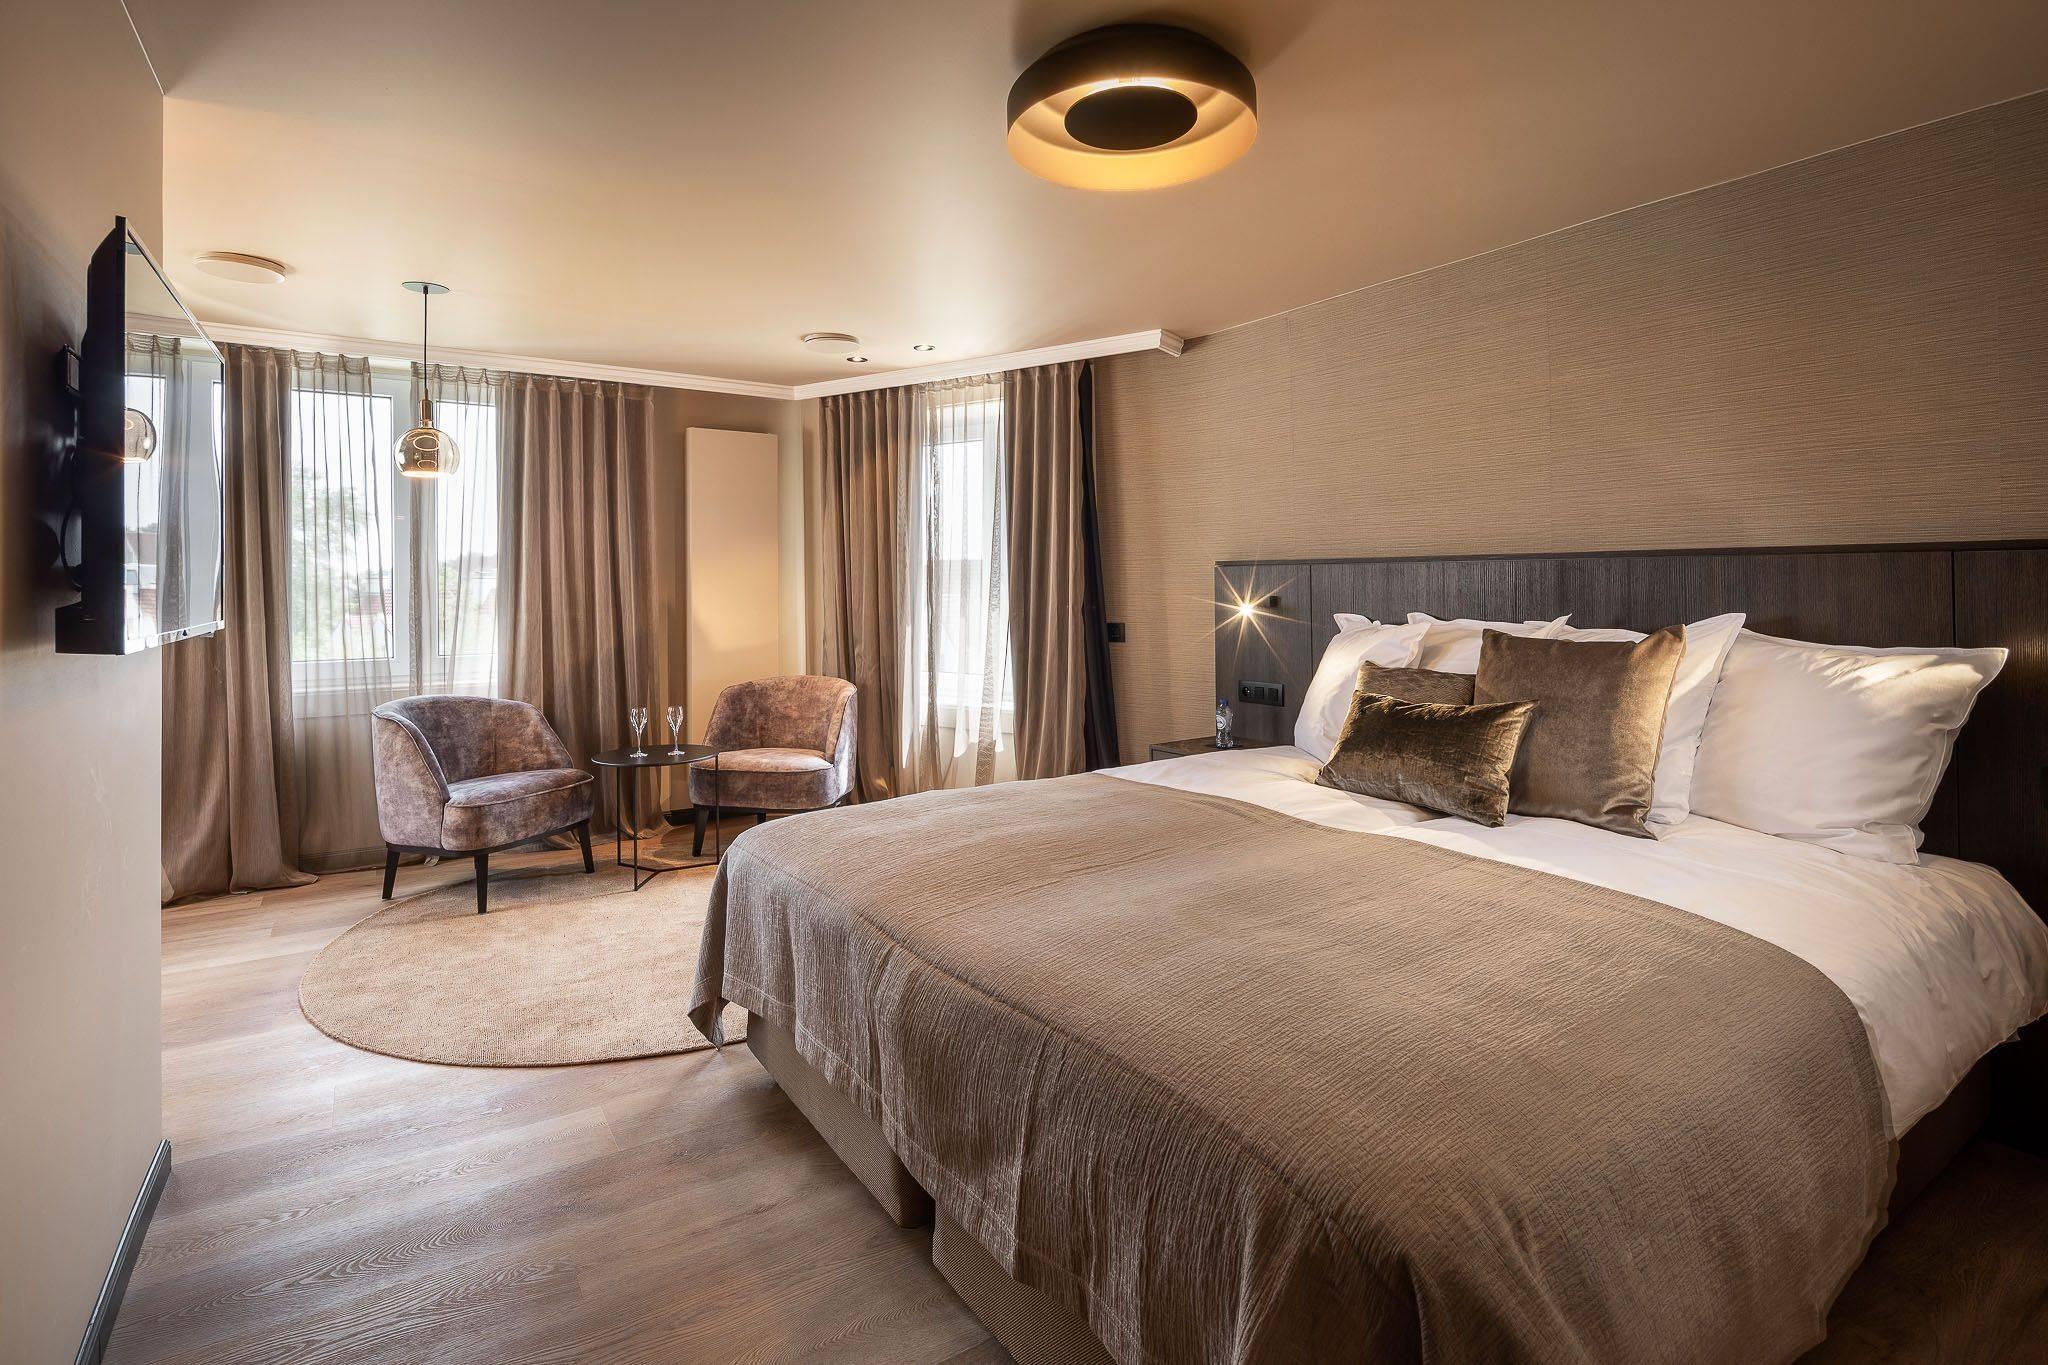 Hotel Lugano SUPERIOR DOUBLE ROOM